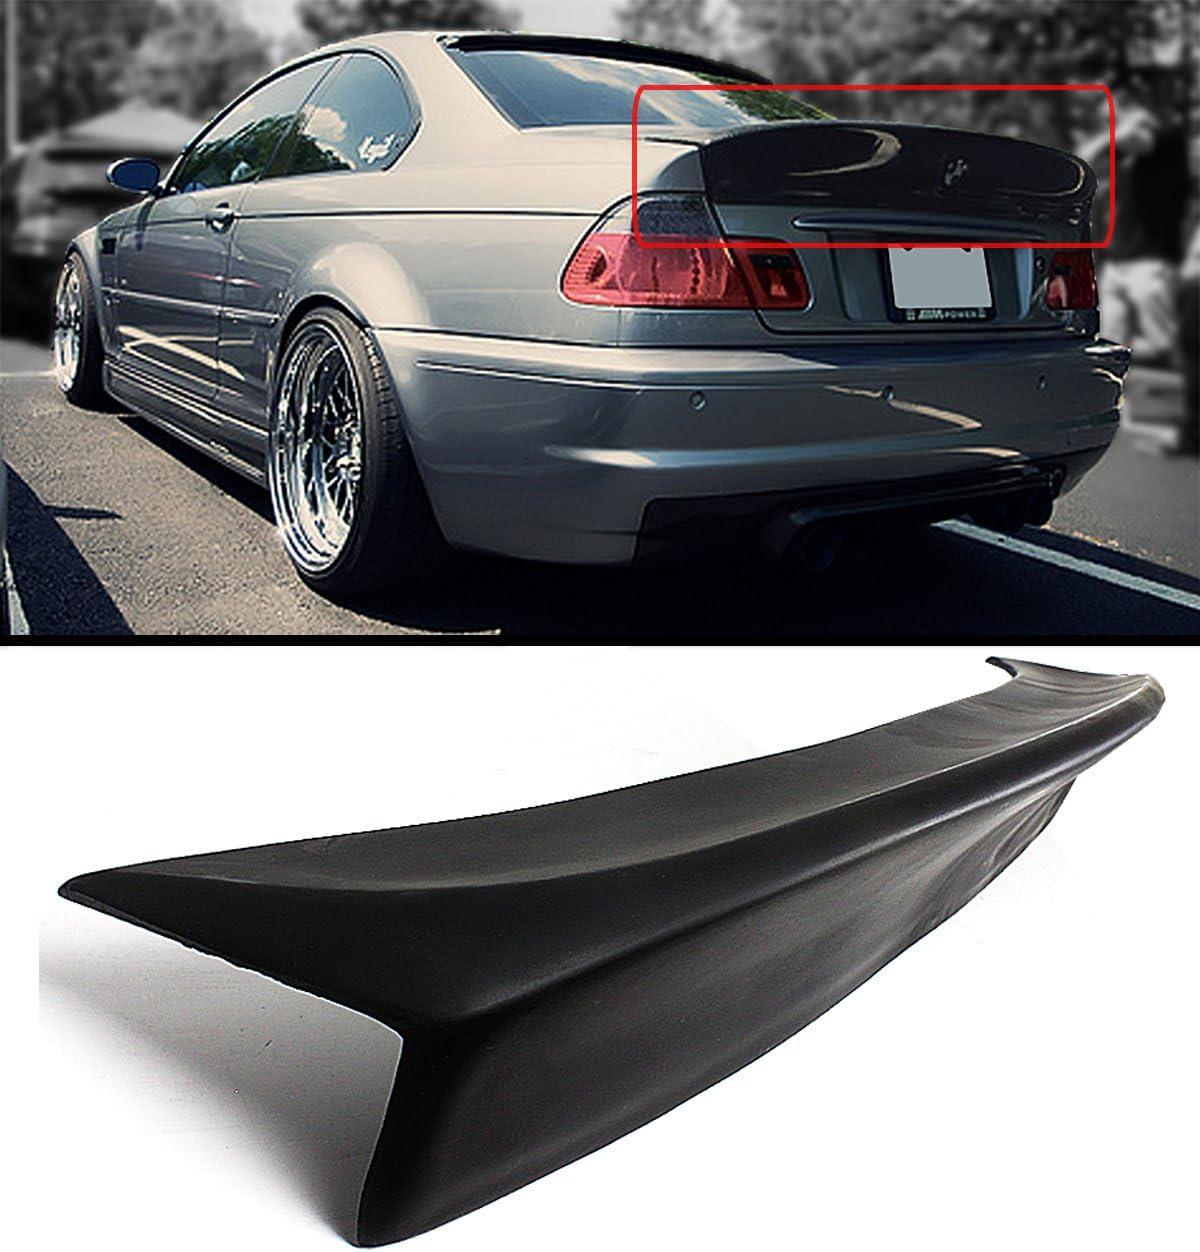 BMW E46 M3 Model added CSL Style Painted Matte Black Front Lip Spoiler